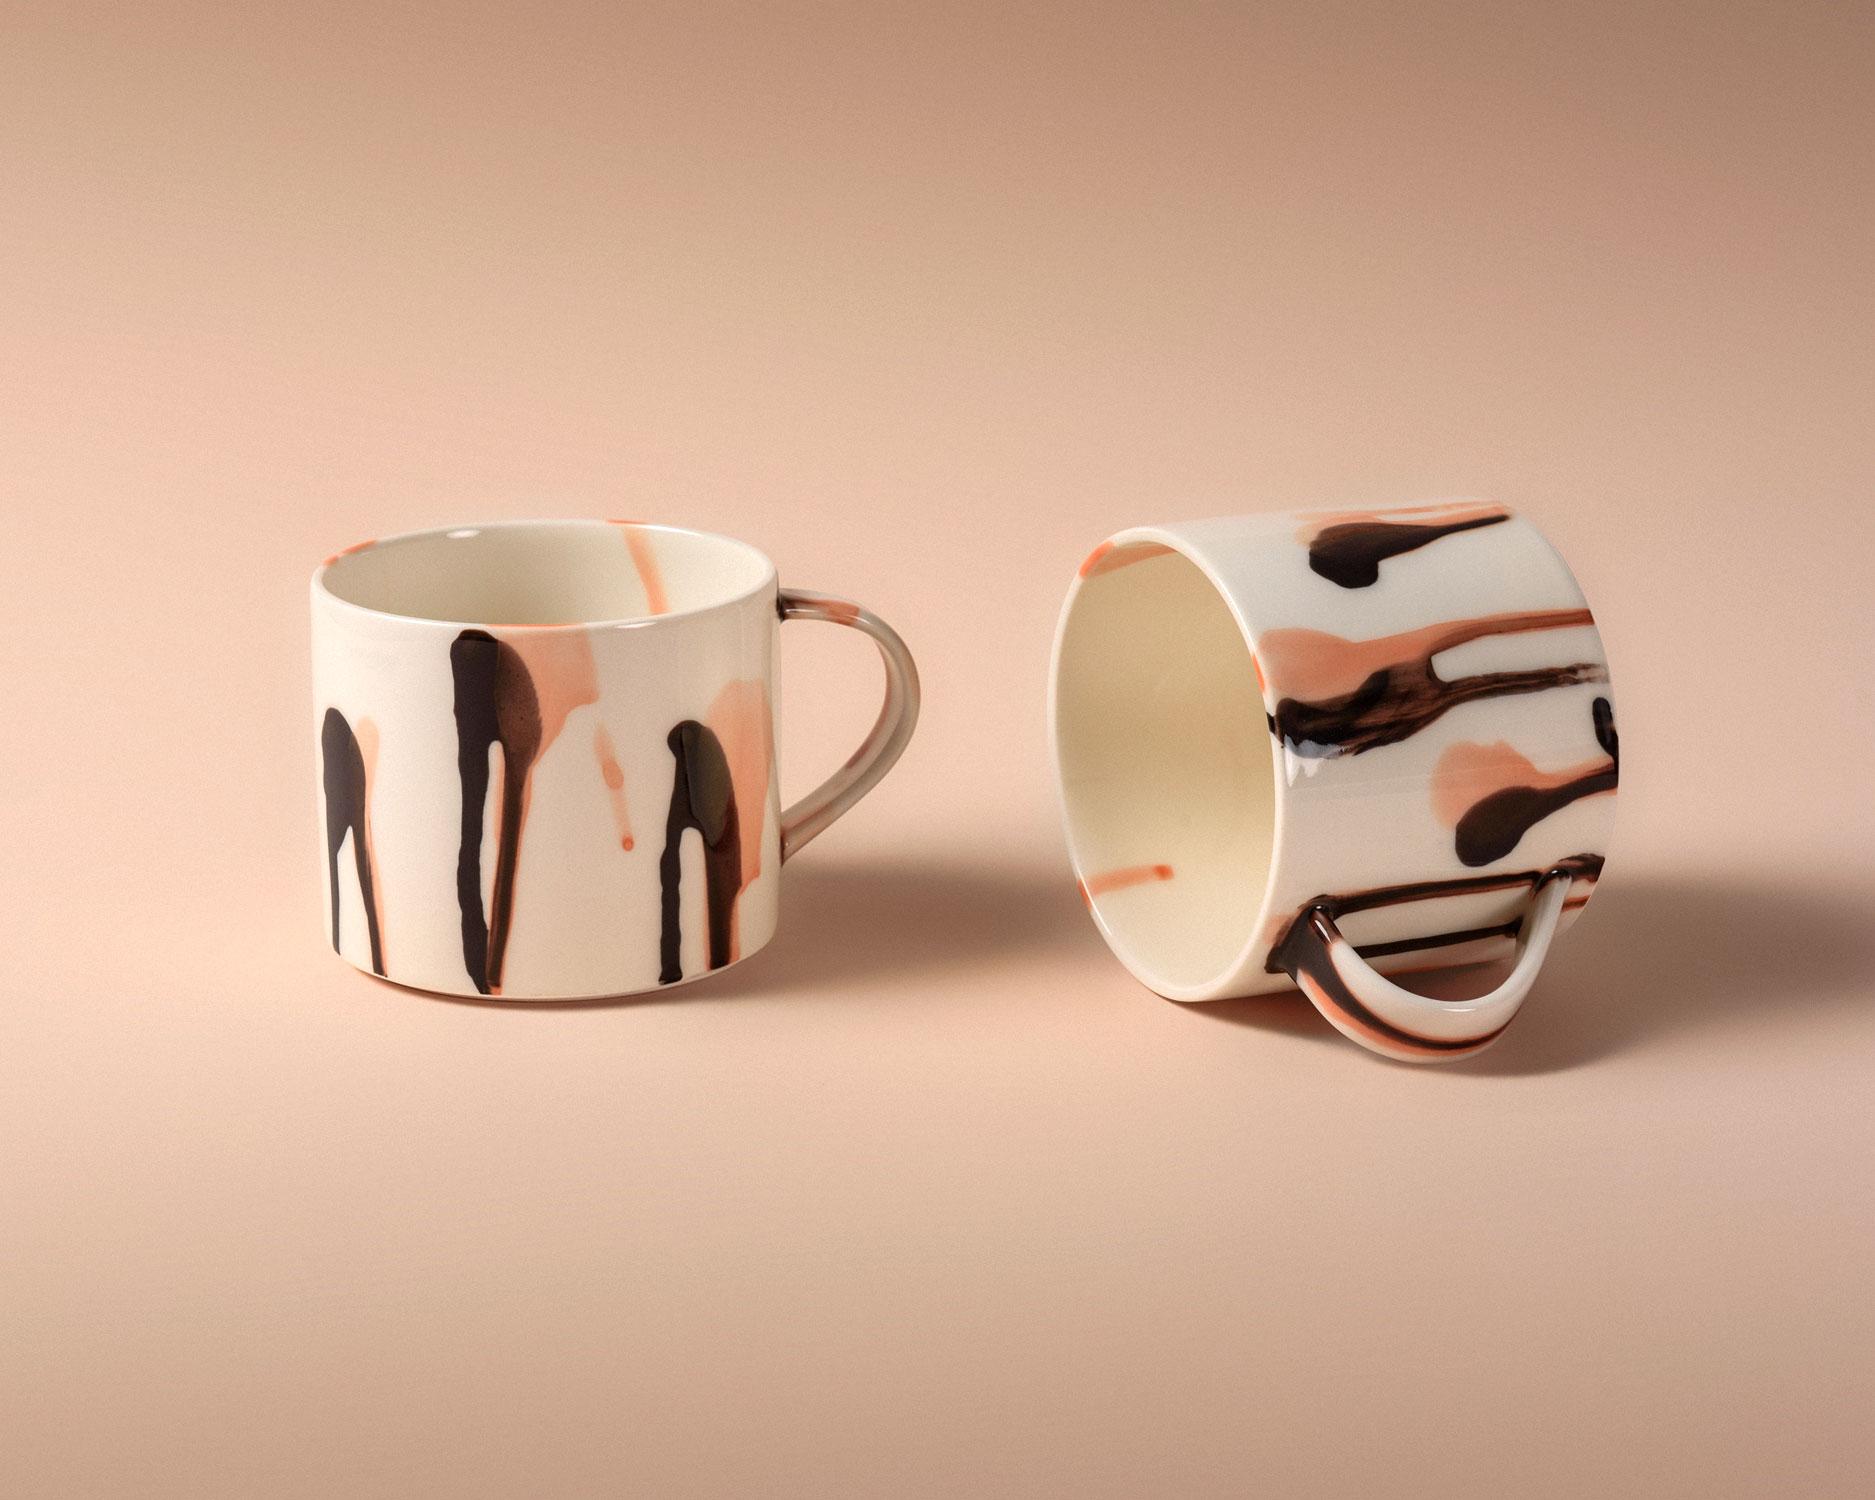 kerfuffle-tea-cup-3-pp.jpg